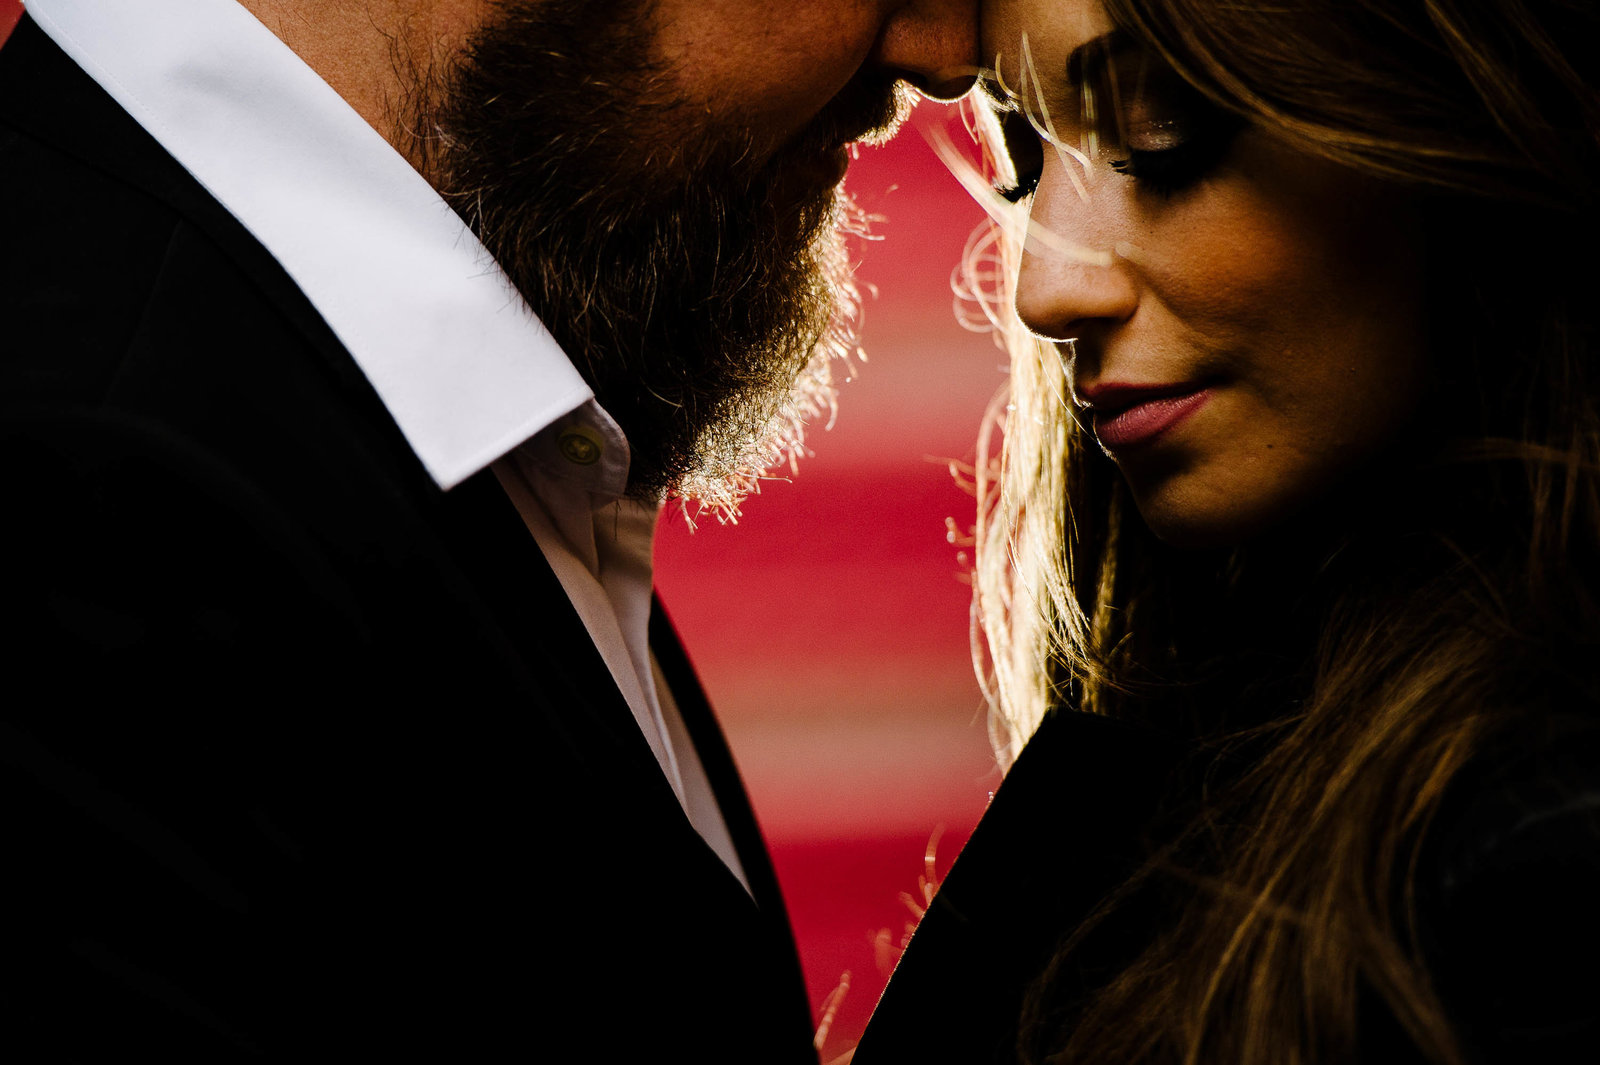 018-El-paso-wedding-photographer-ArKe_0159